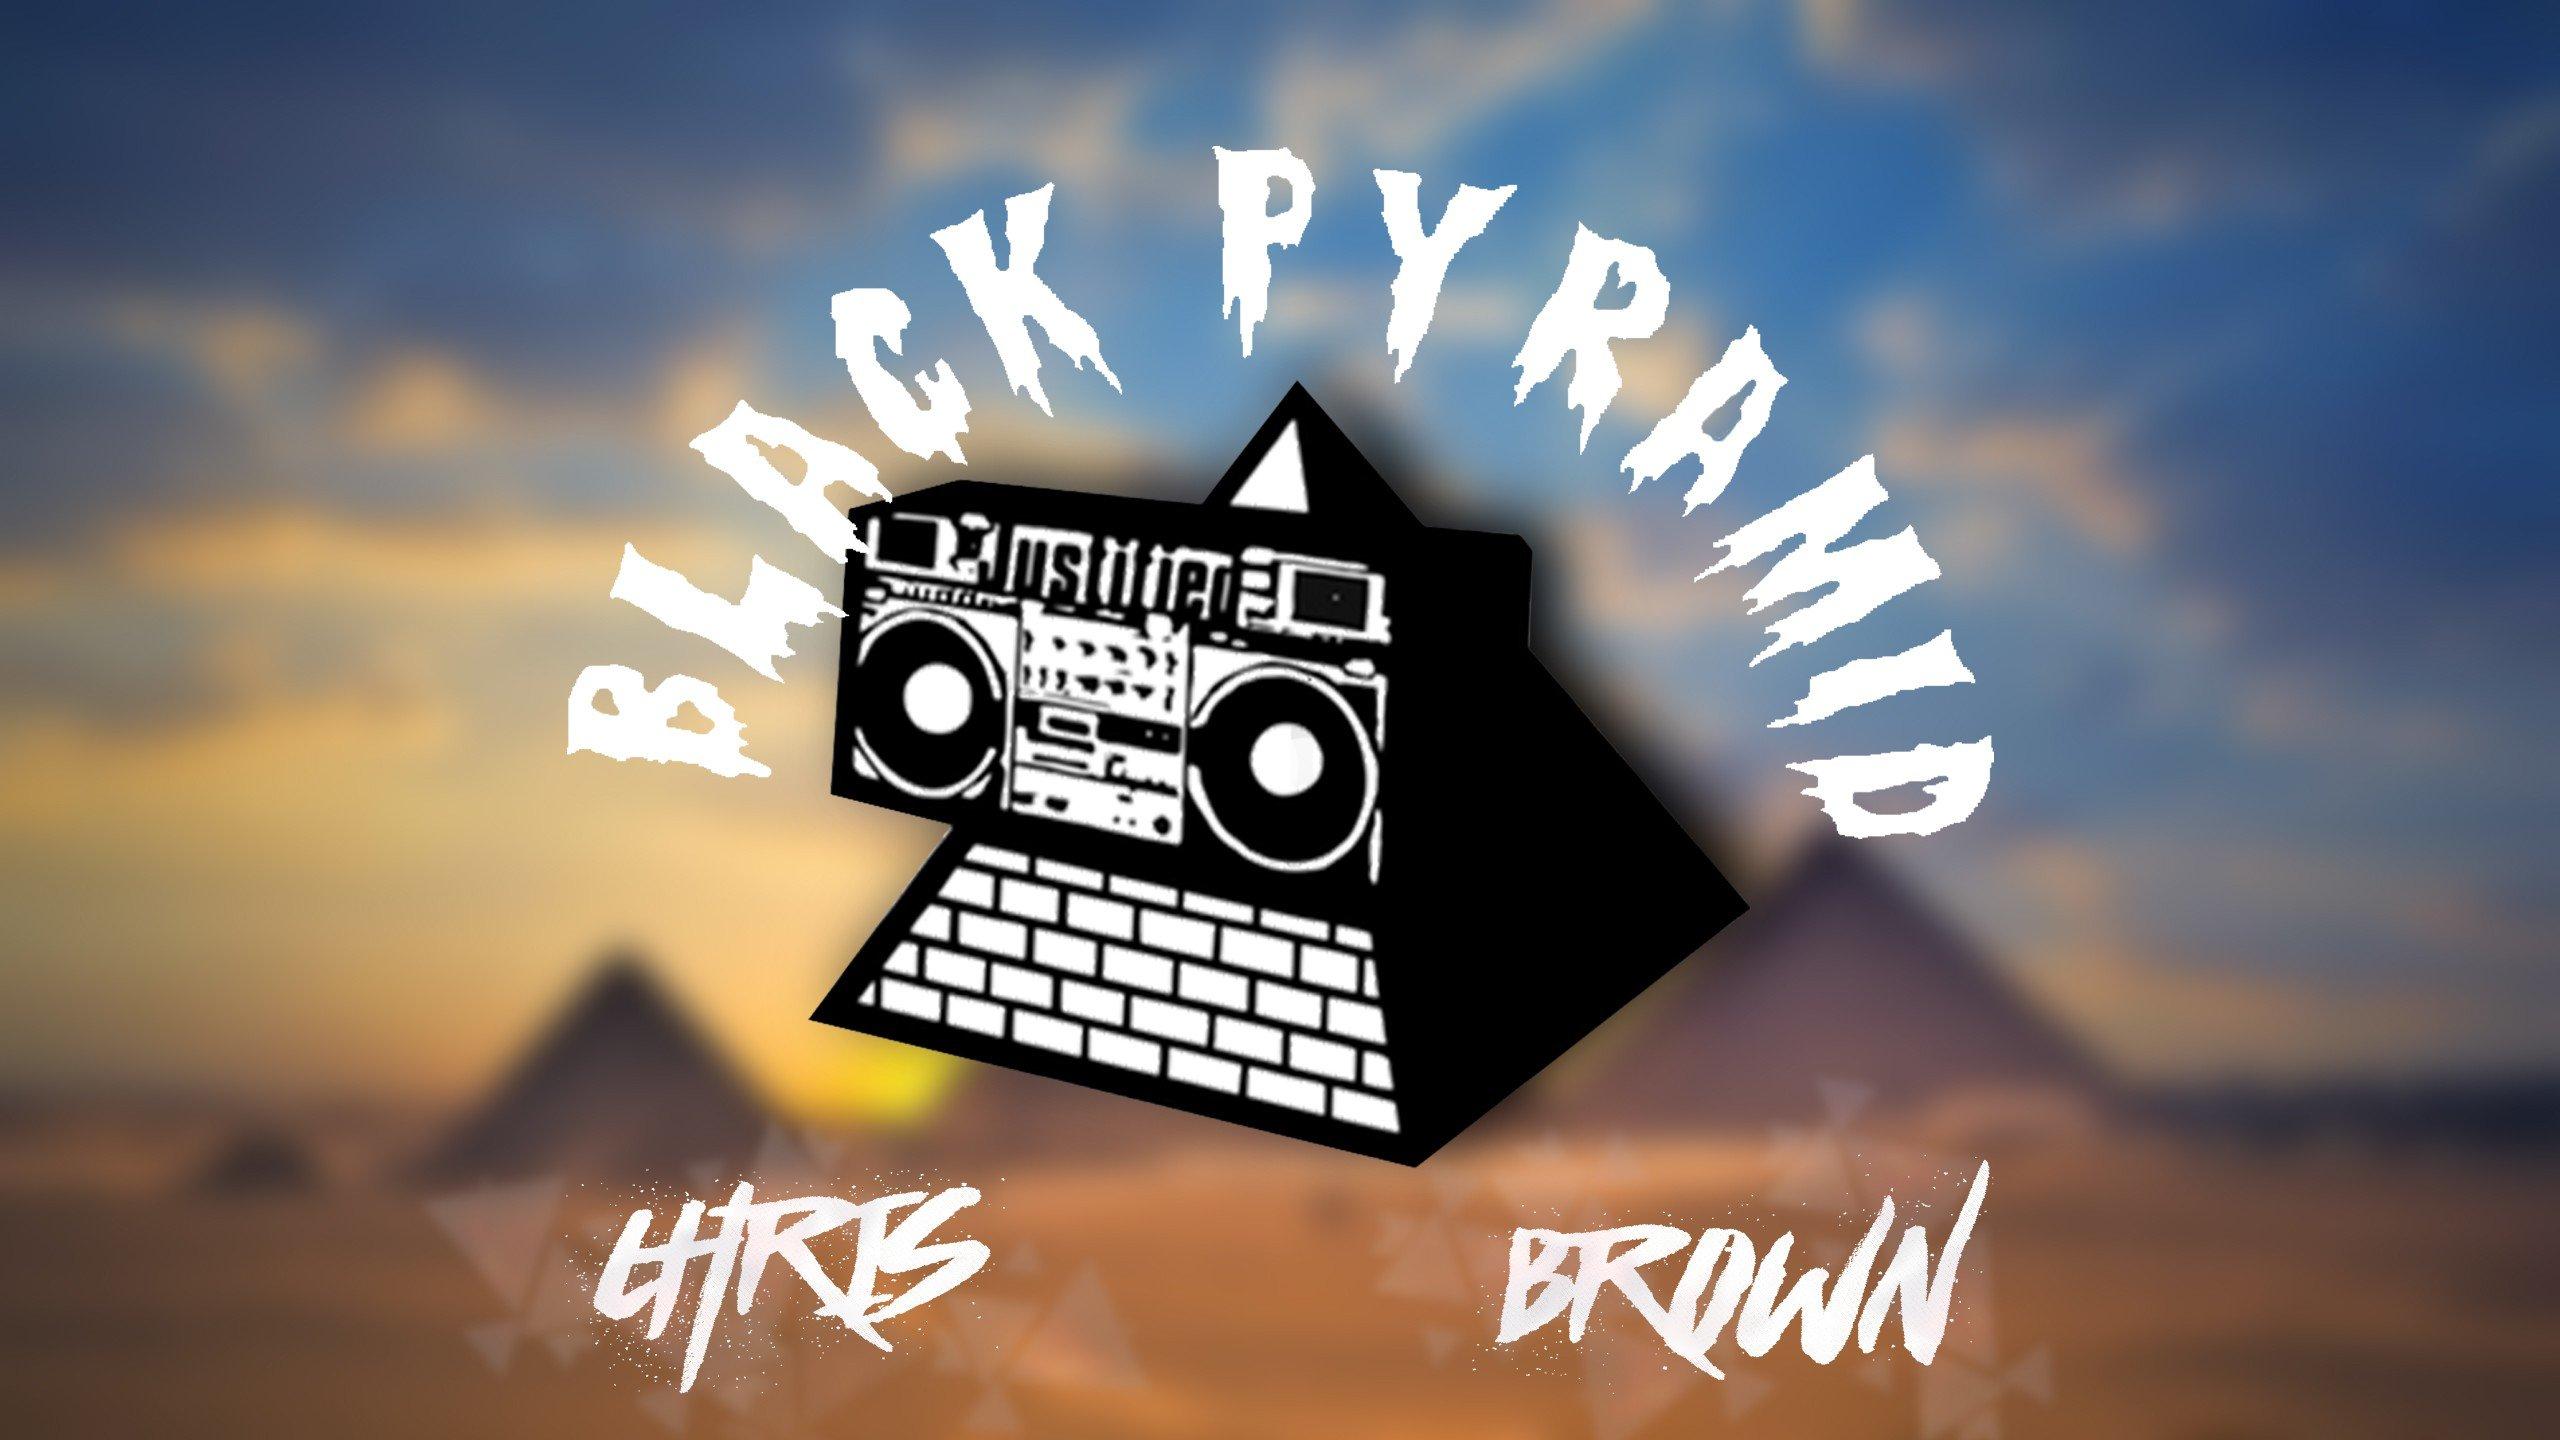 20] Black Pyramid Wallpapers on WallpaperSafari 2560x1440